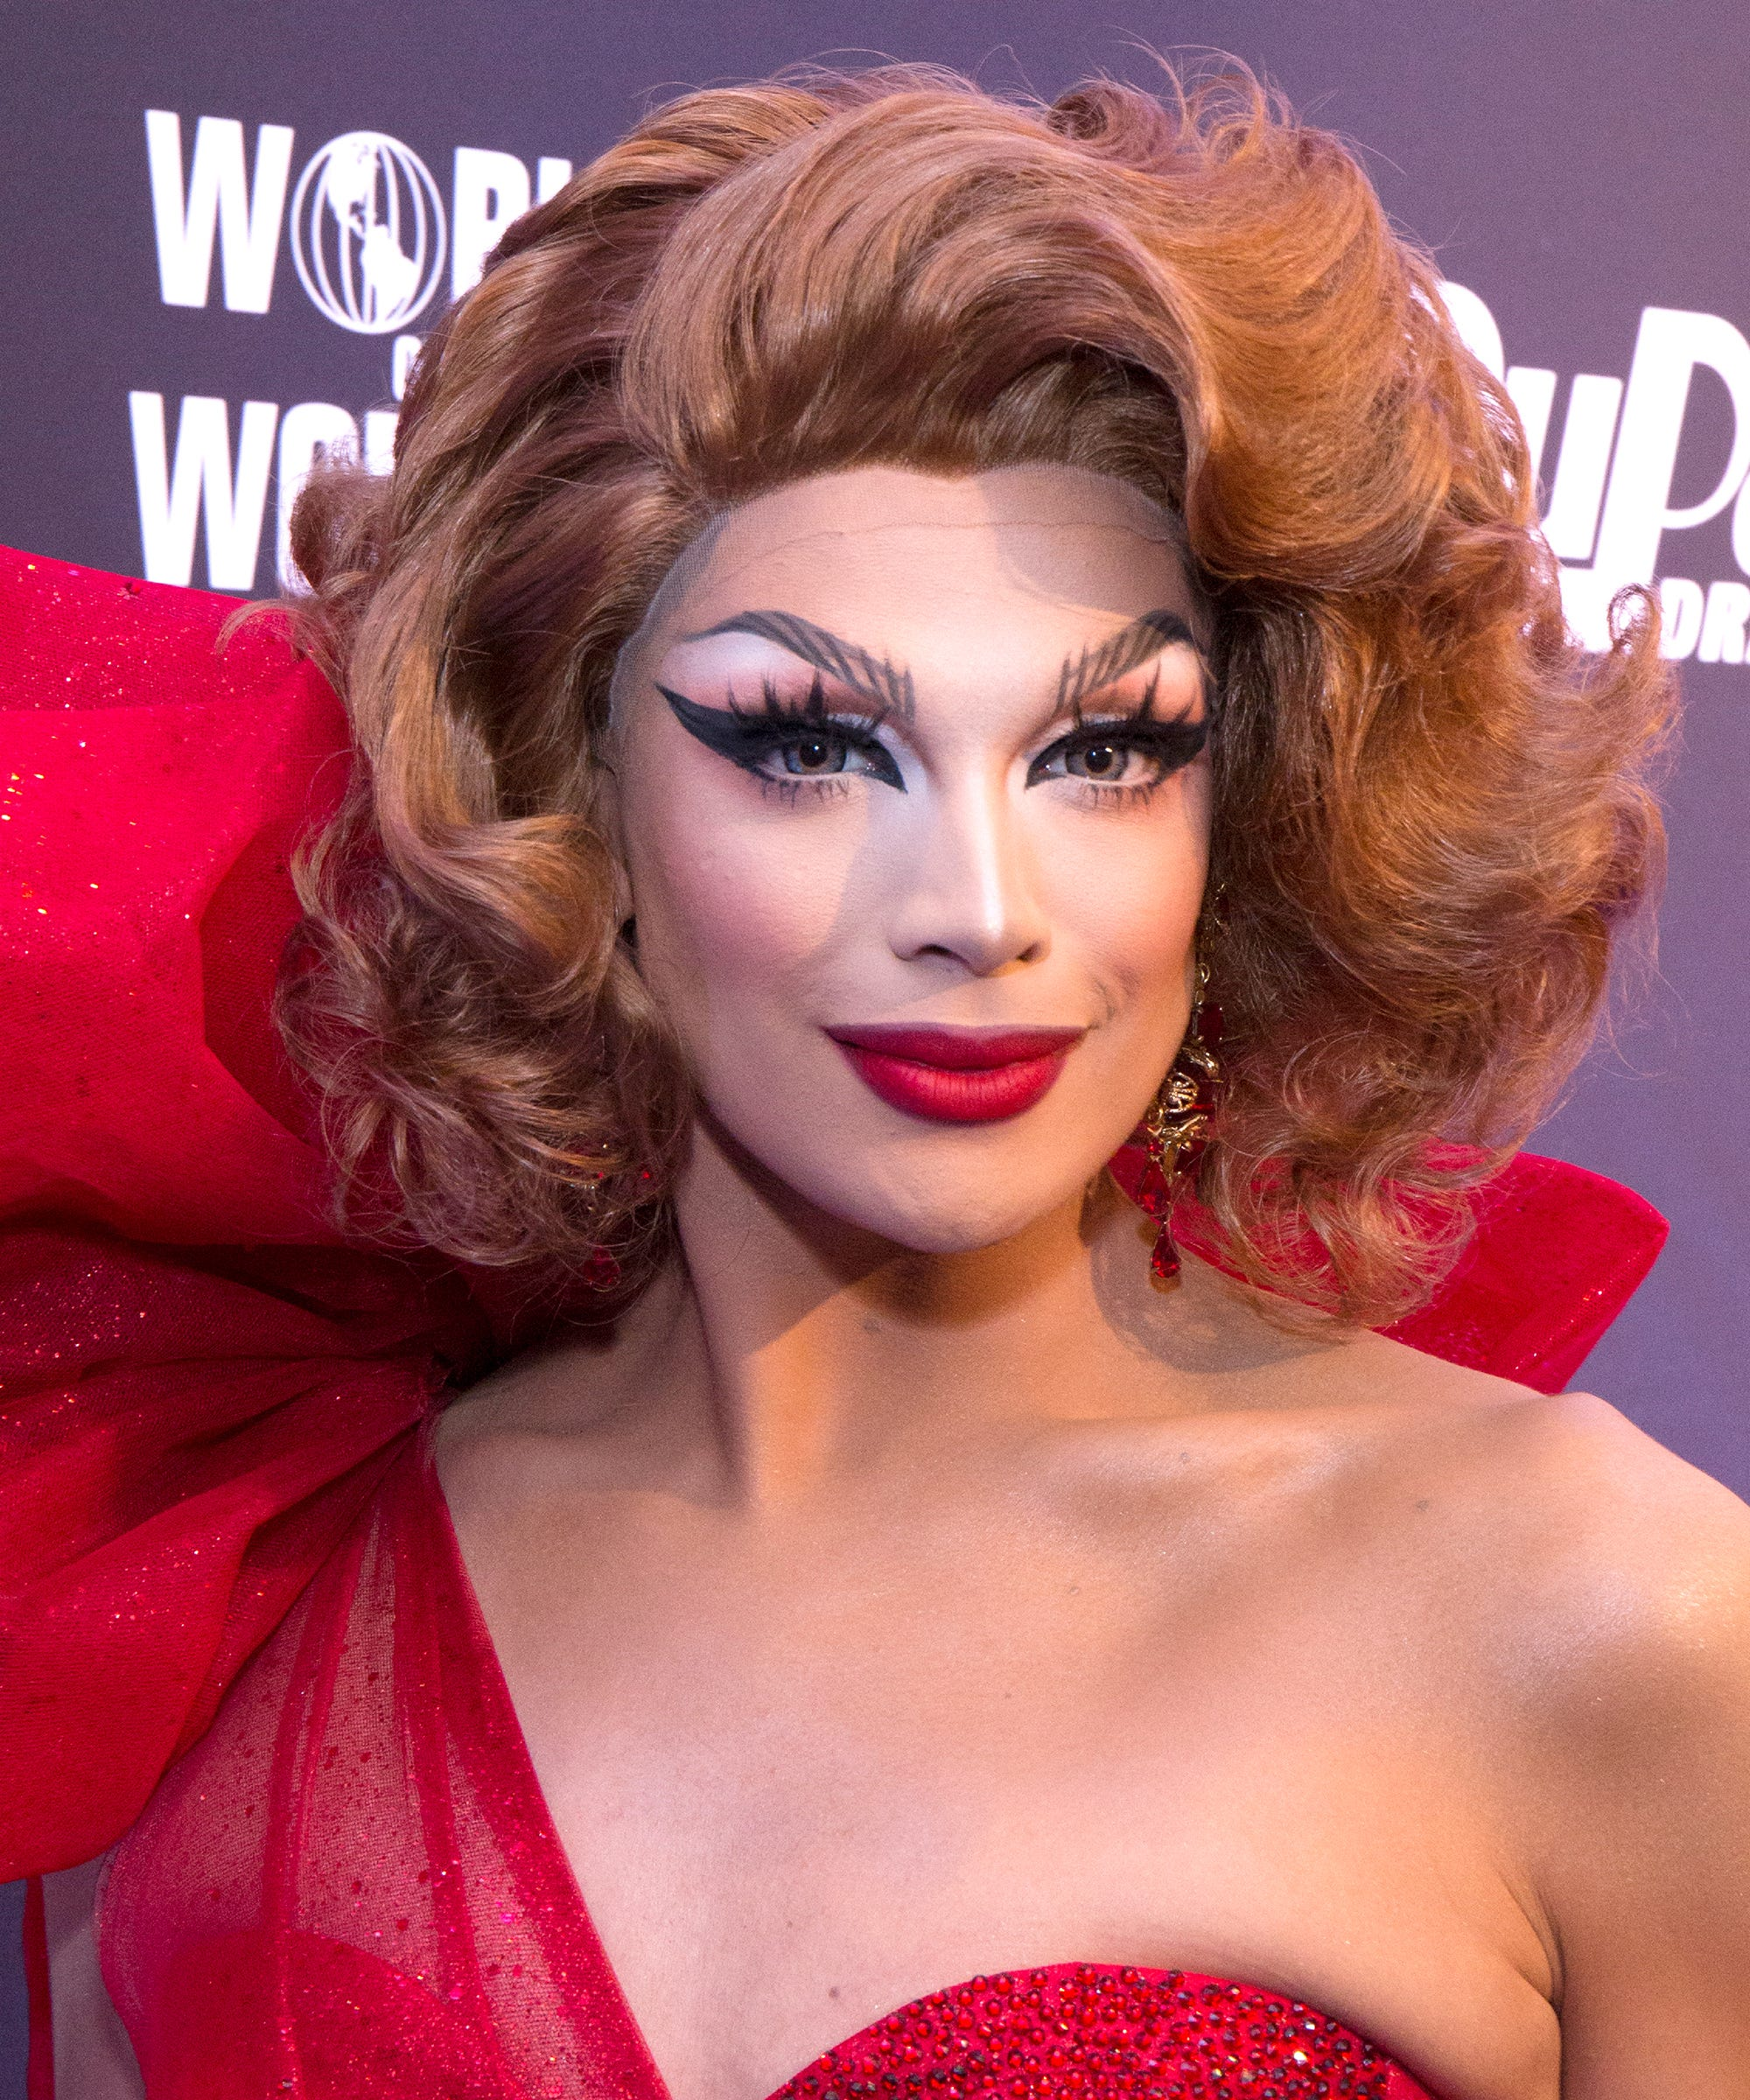 best dating makeup tutorials to watch on netflix